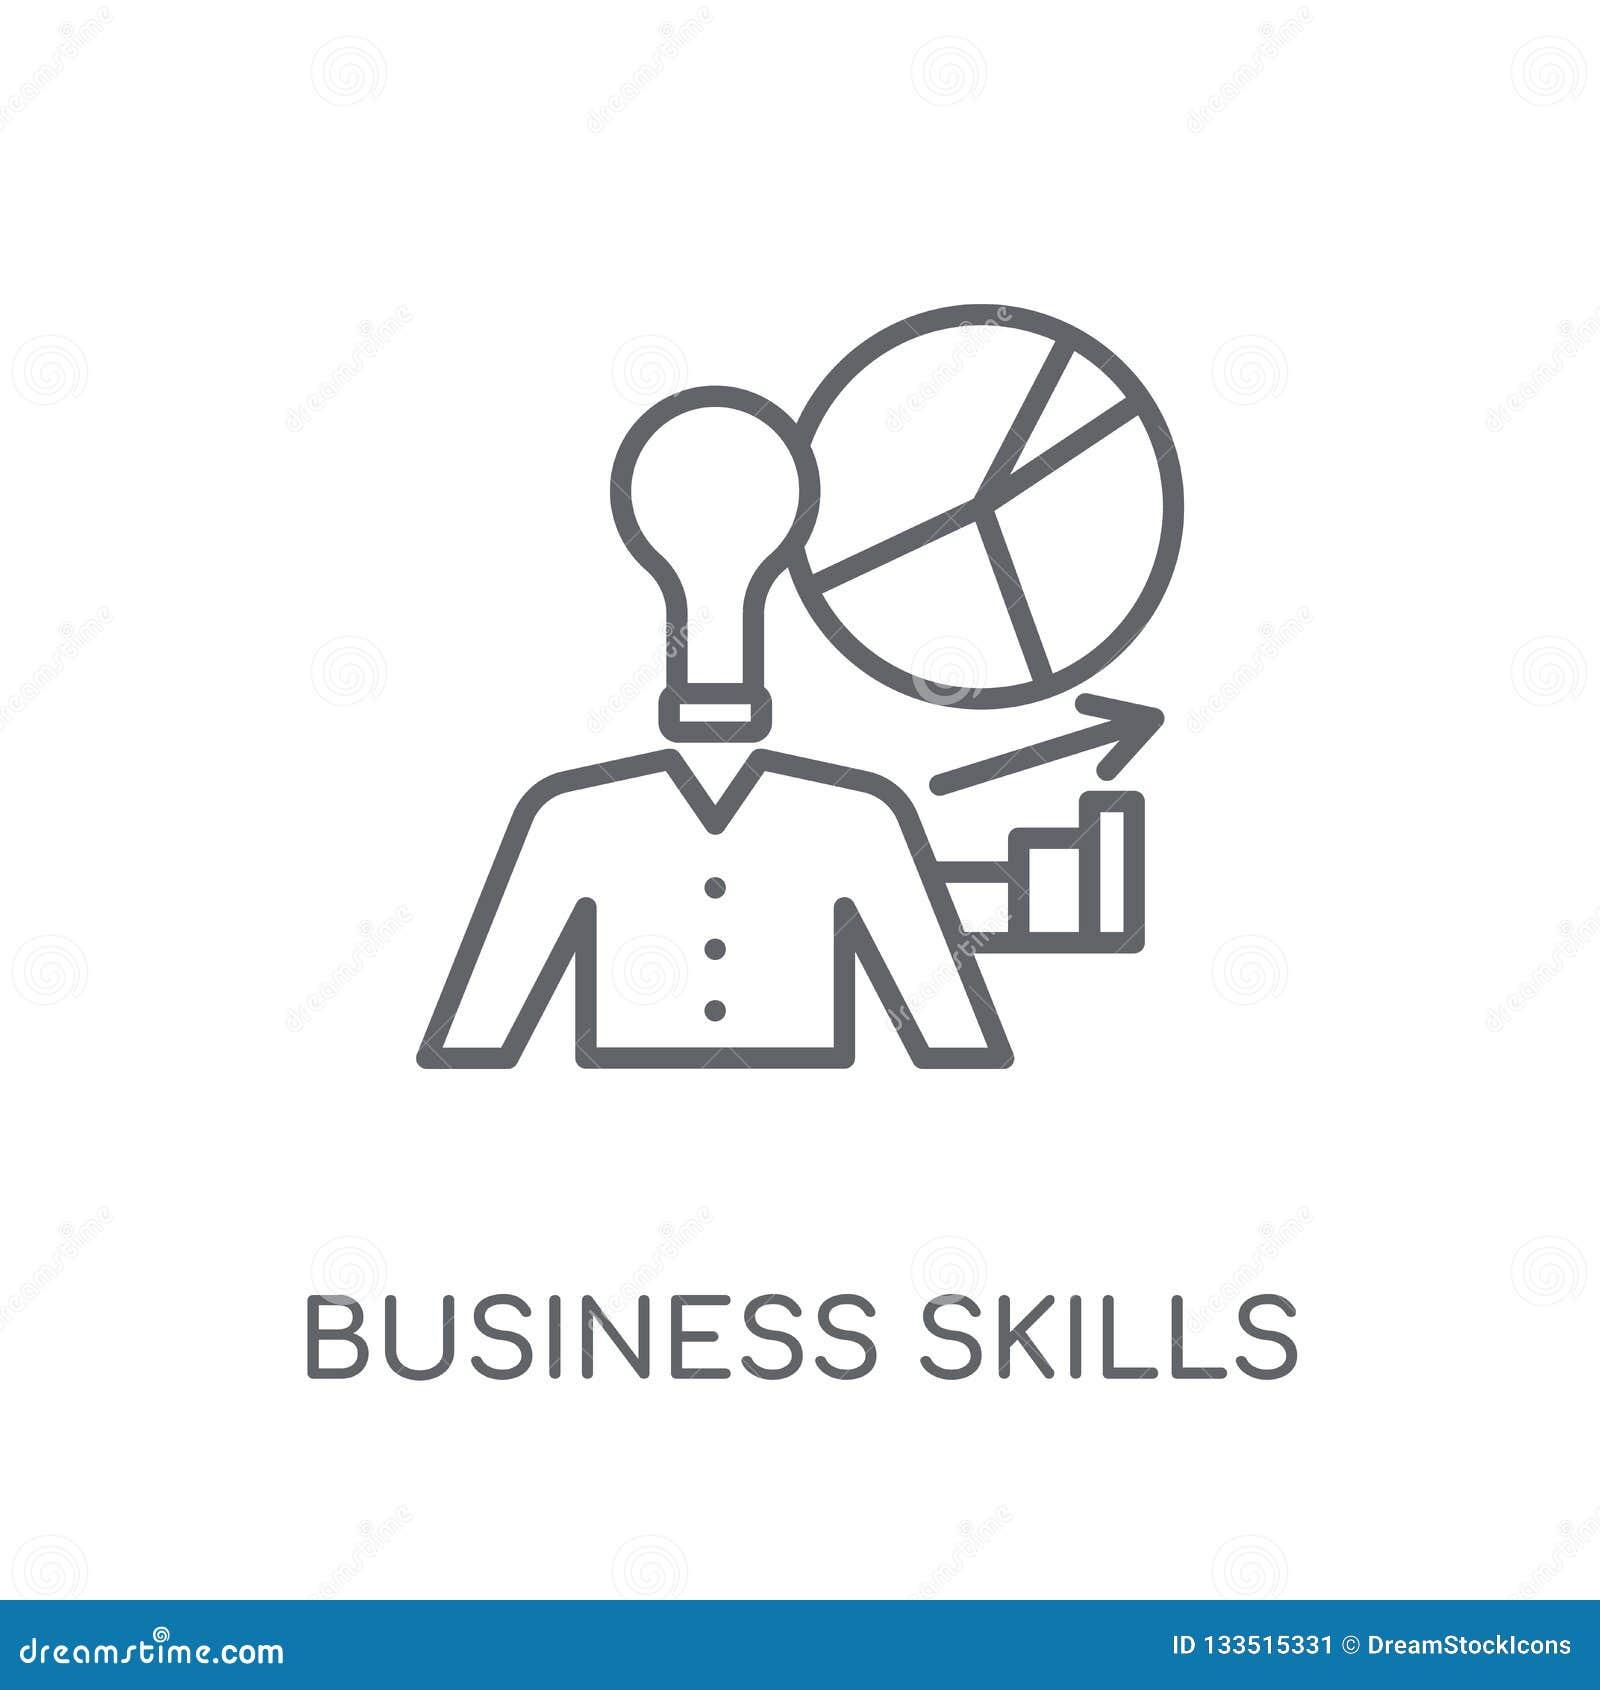 Business skills linear icon. Modern outline Business skills logo